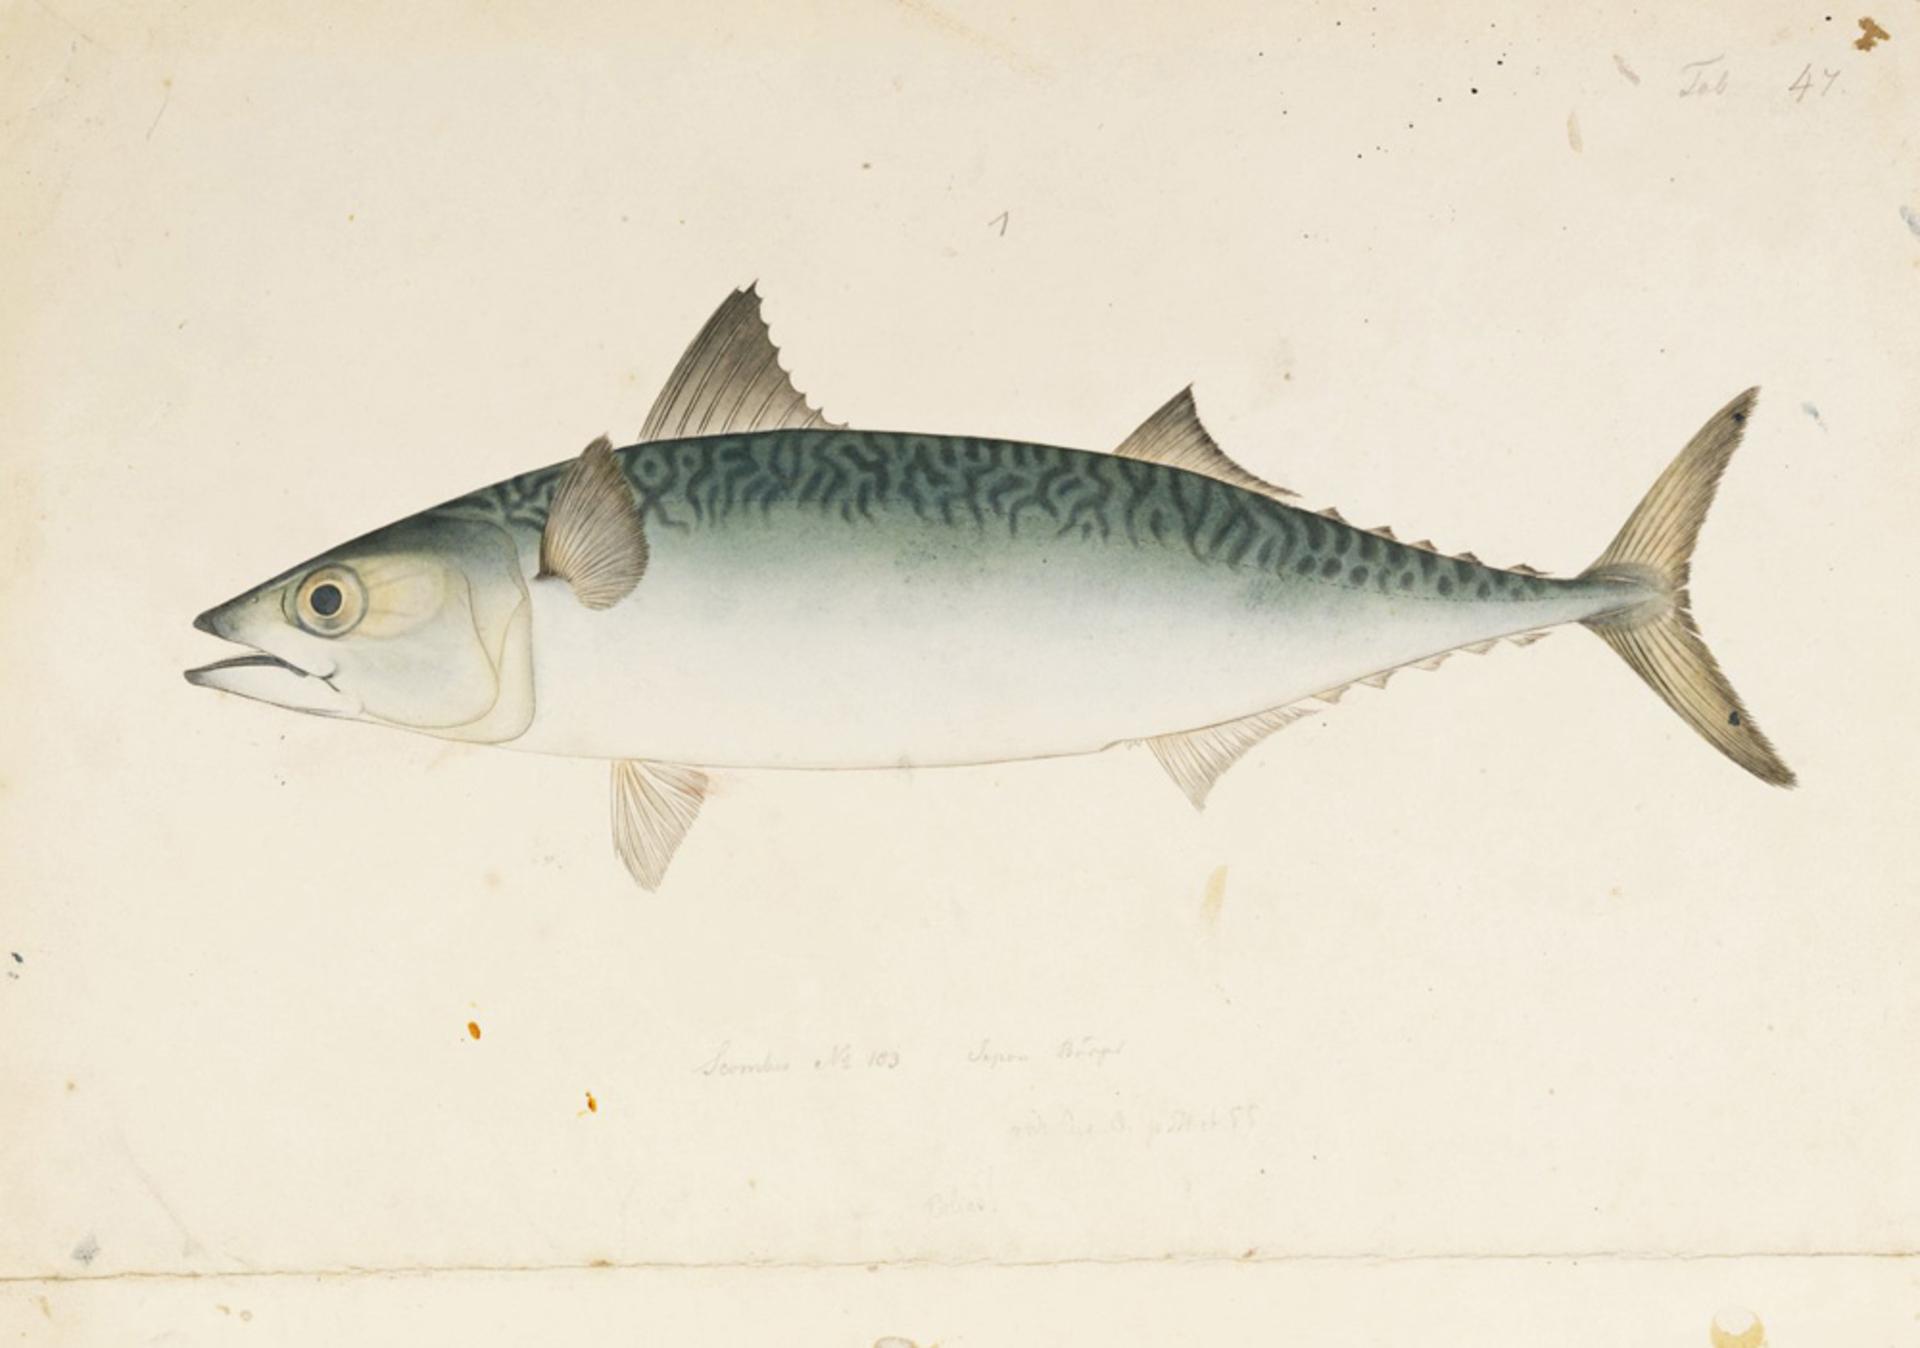 RMNH.ART.543 | Scomber japonicus